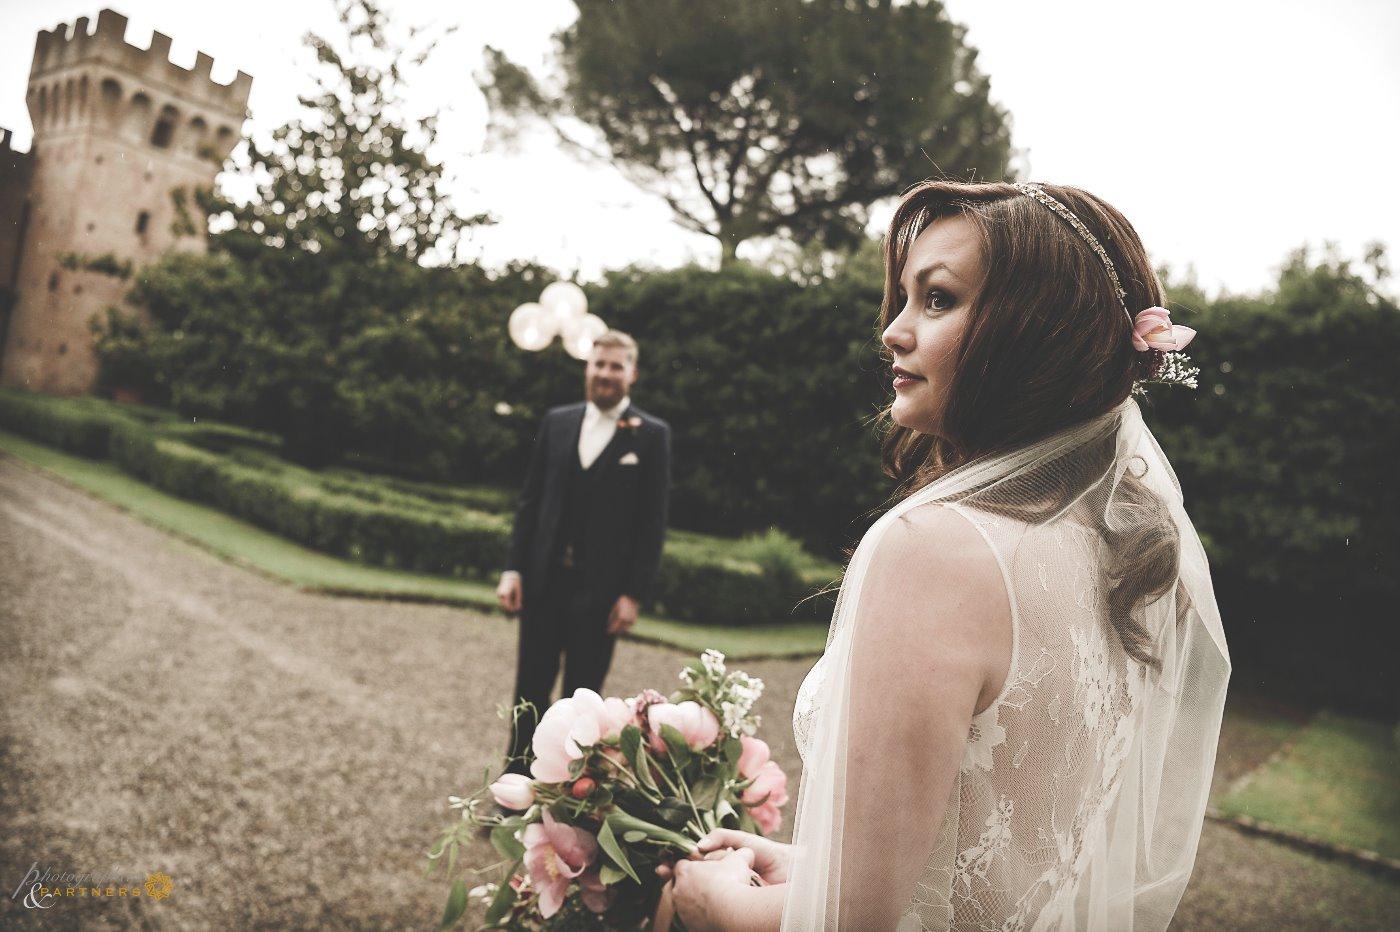 photos_weddings_castello_oliveto_16.jpg